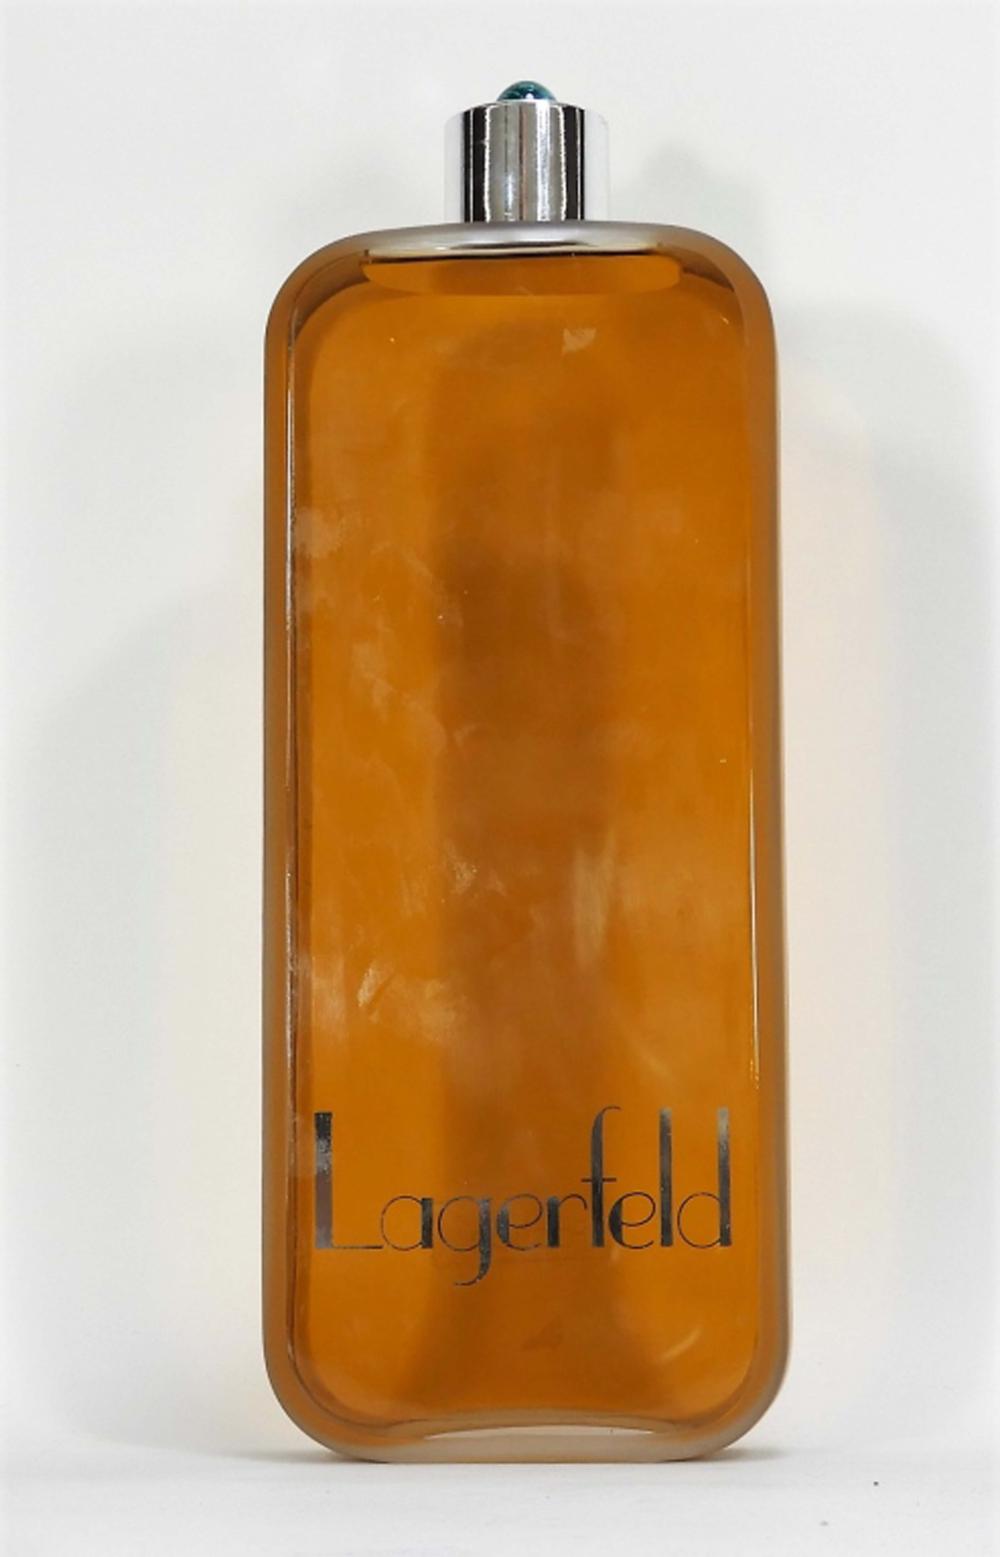 LG Karl Lagerfeld Factice Display Cologne Bottle